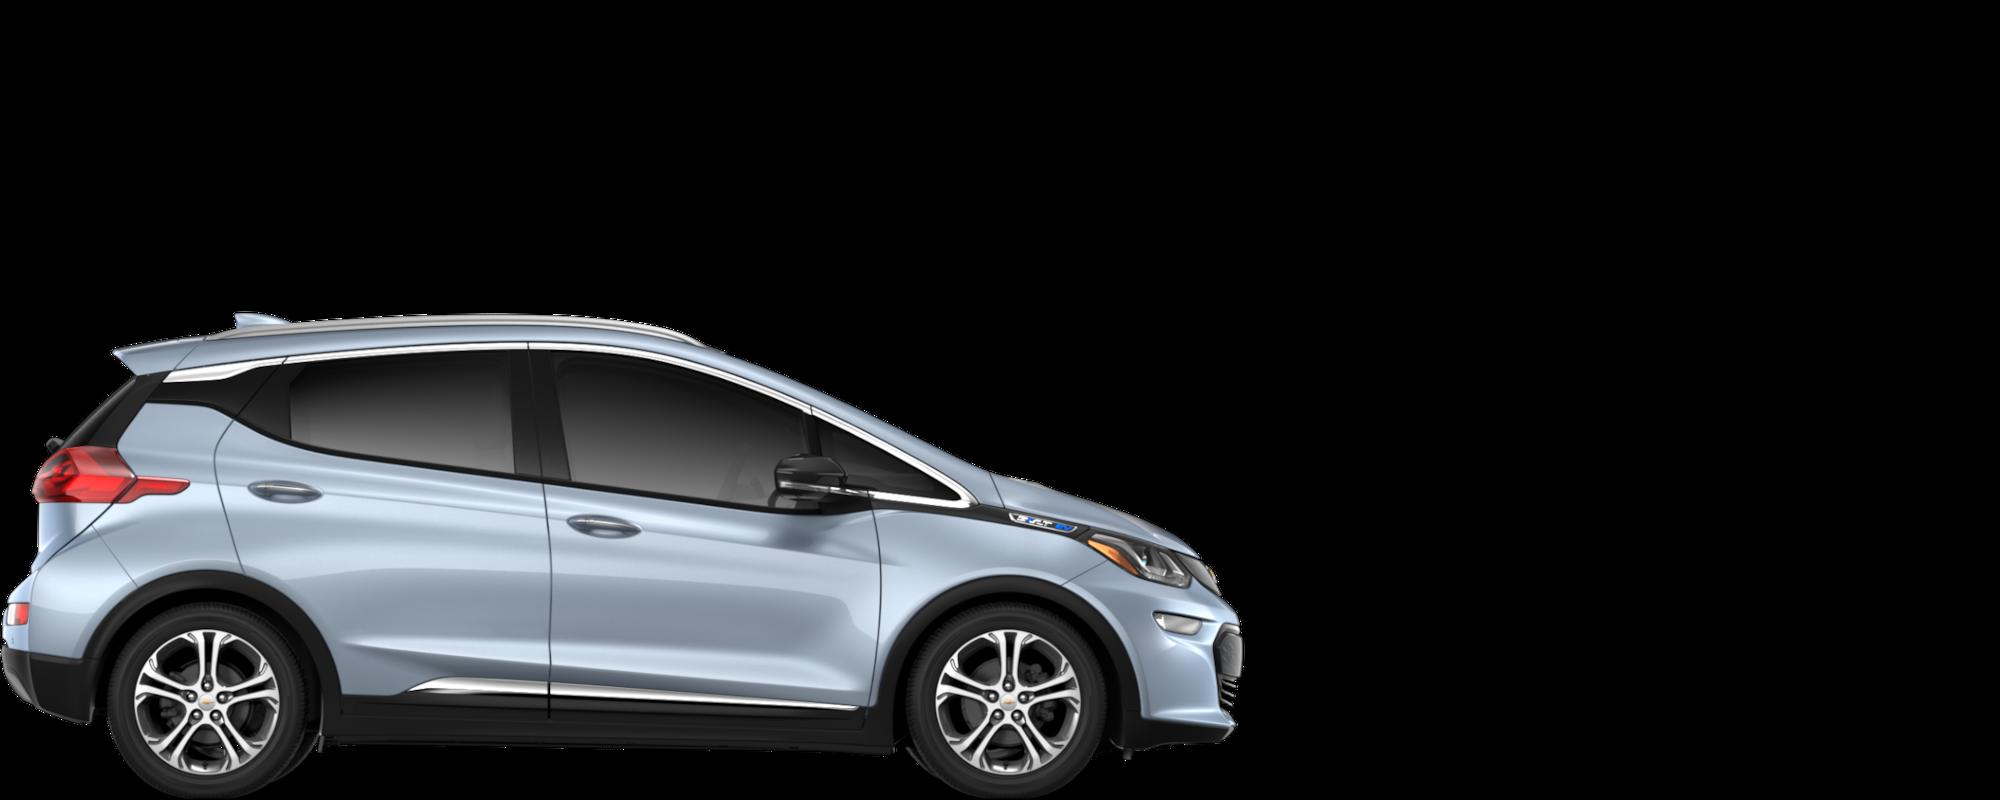 Special factory incentives on 2019 Chevrolet Bolt EV in Roseville CA